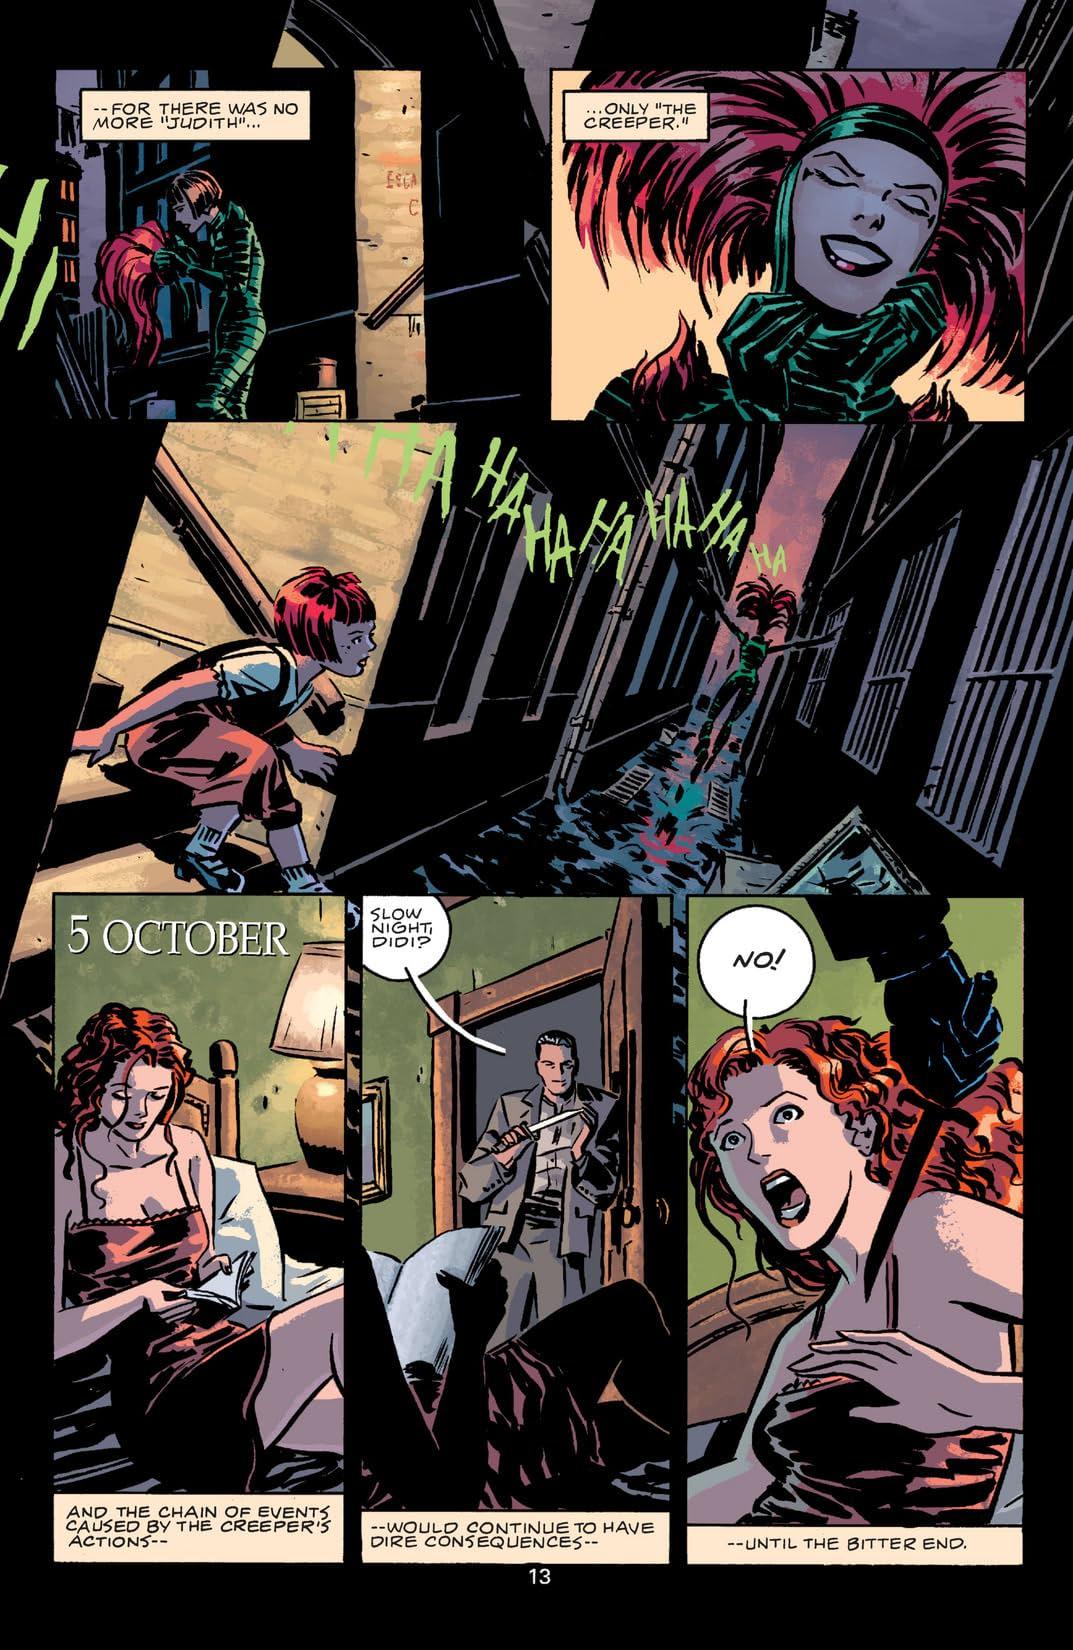 Beware The Creeper (2003) #4 (of 5)